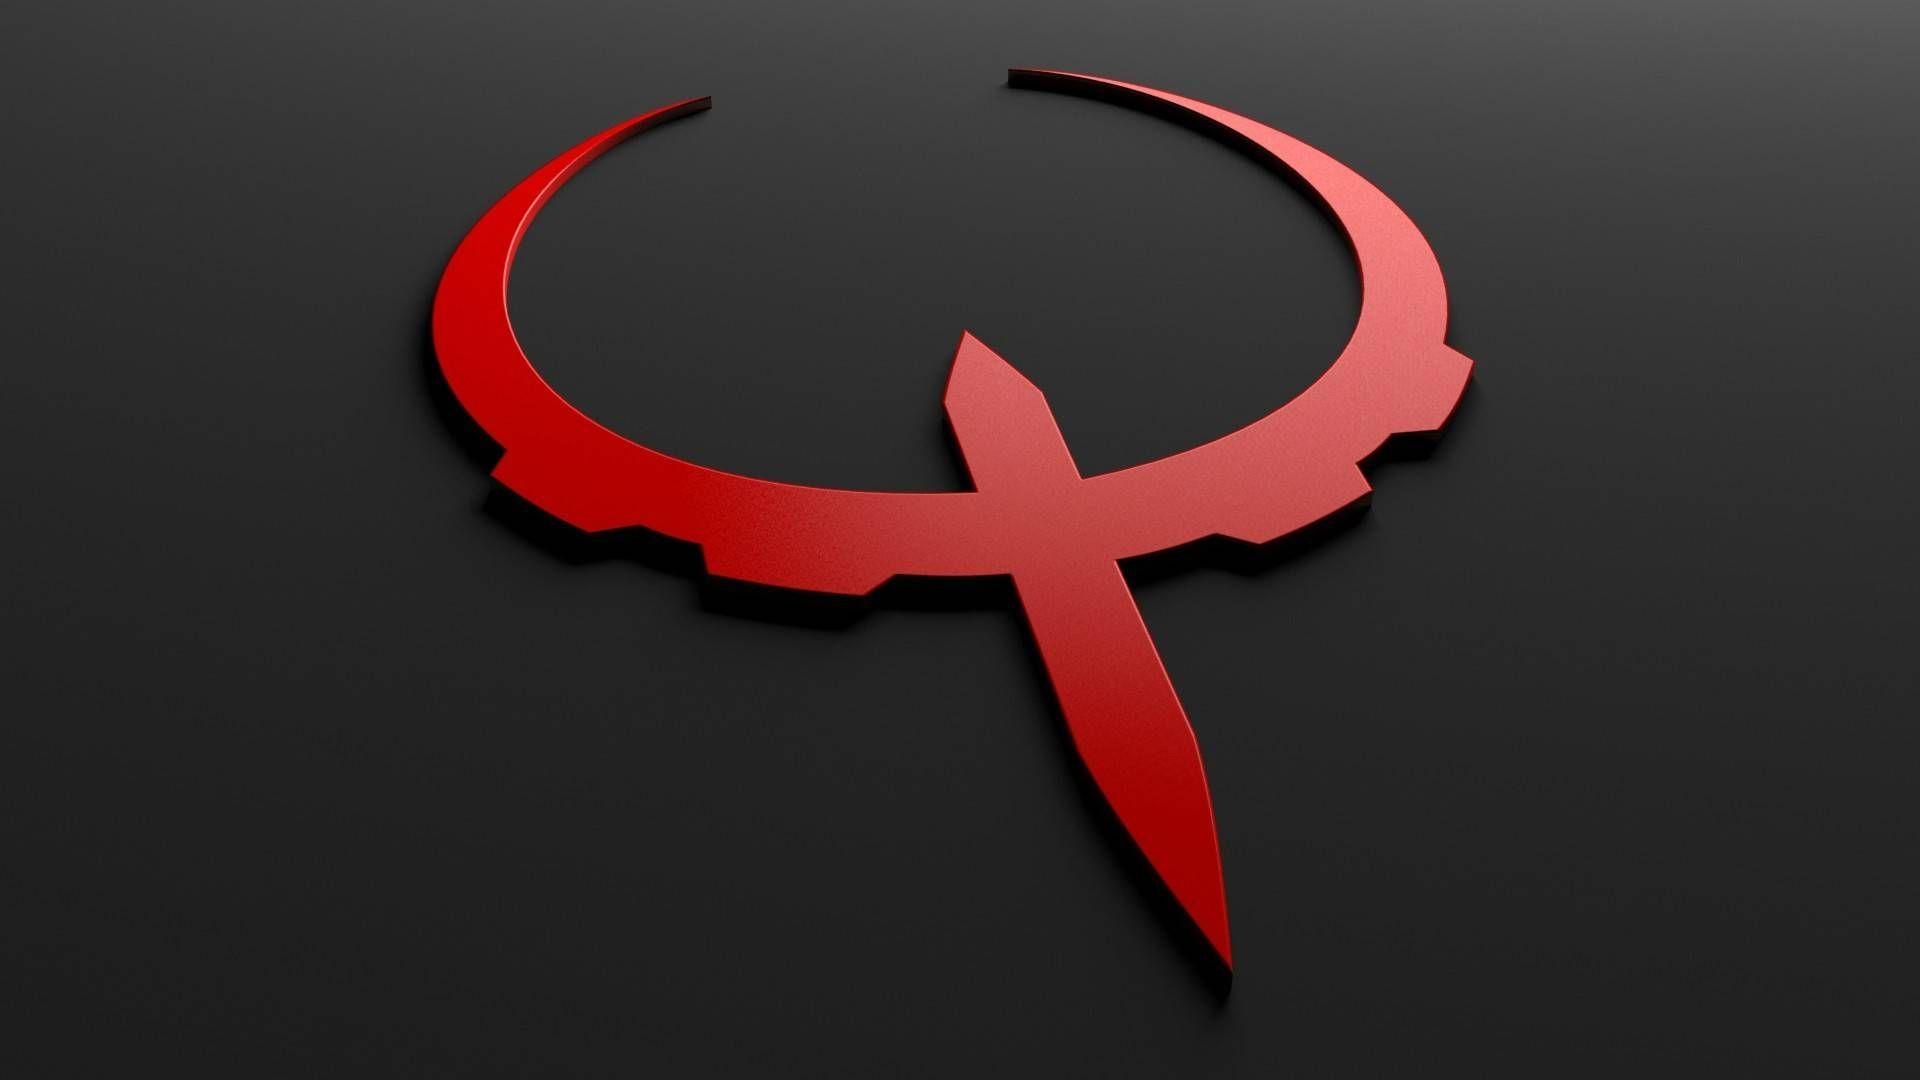 Quake Champions Wallpapers Hd Backgrounds Images Pics Photos Id Software Wallpaper Desktop Wallpaper